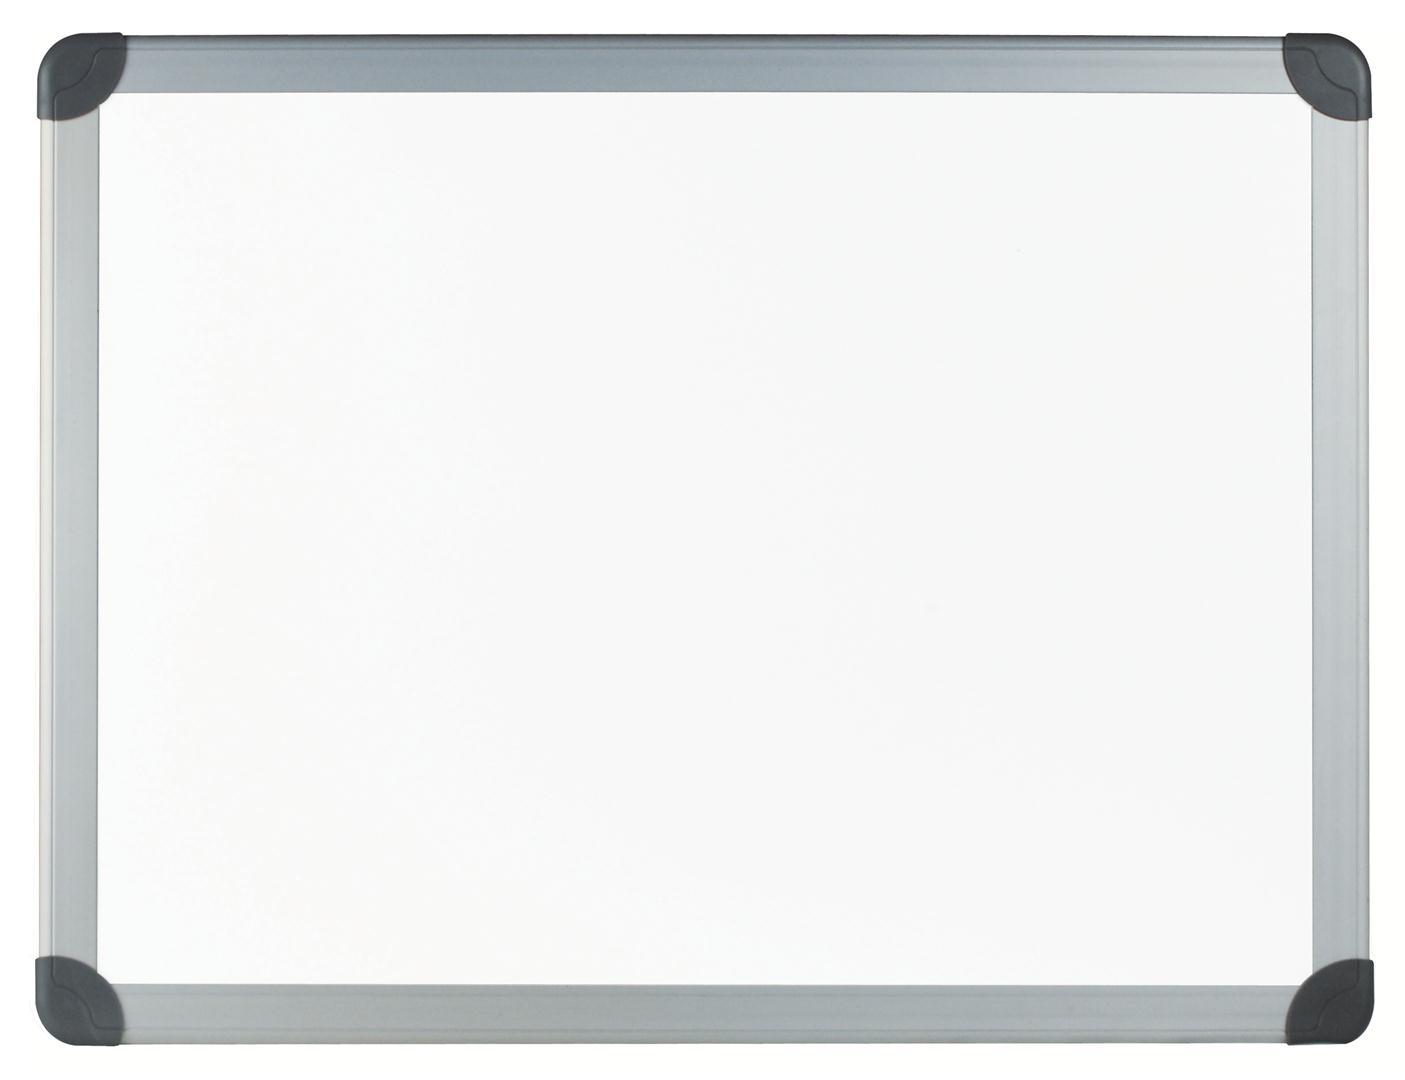 Mini clip art library. Markers clipart small whiteboard